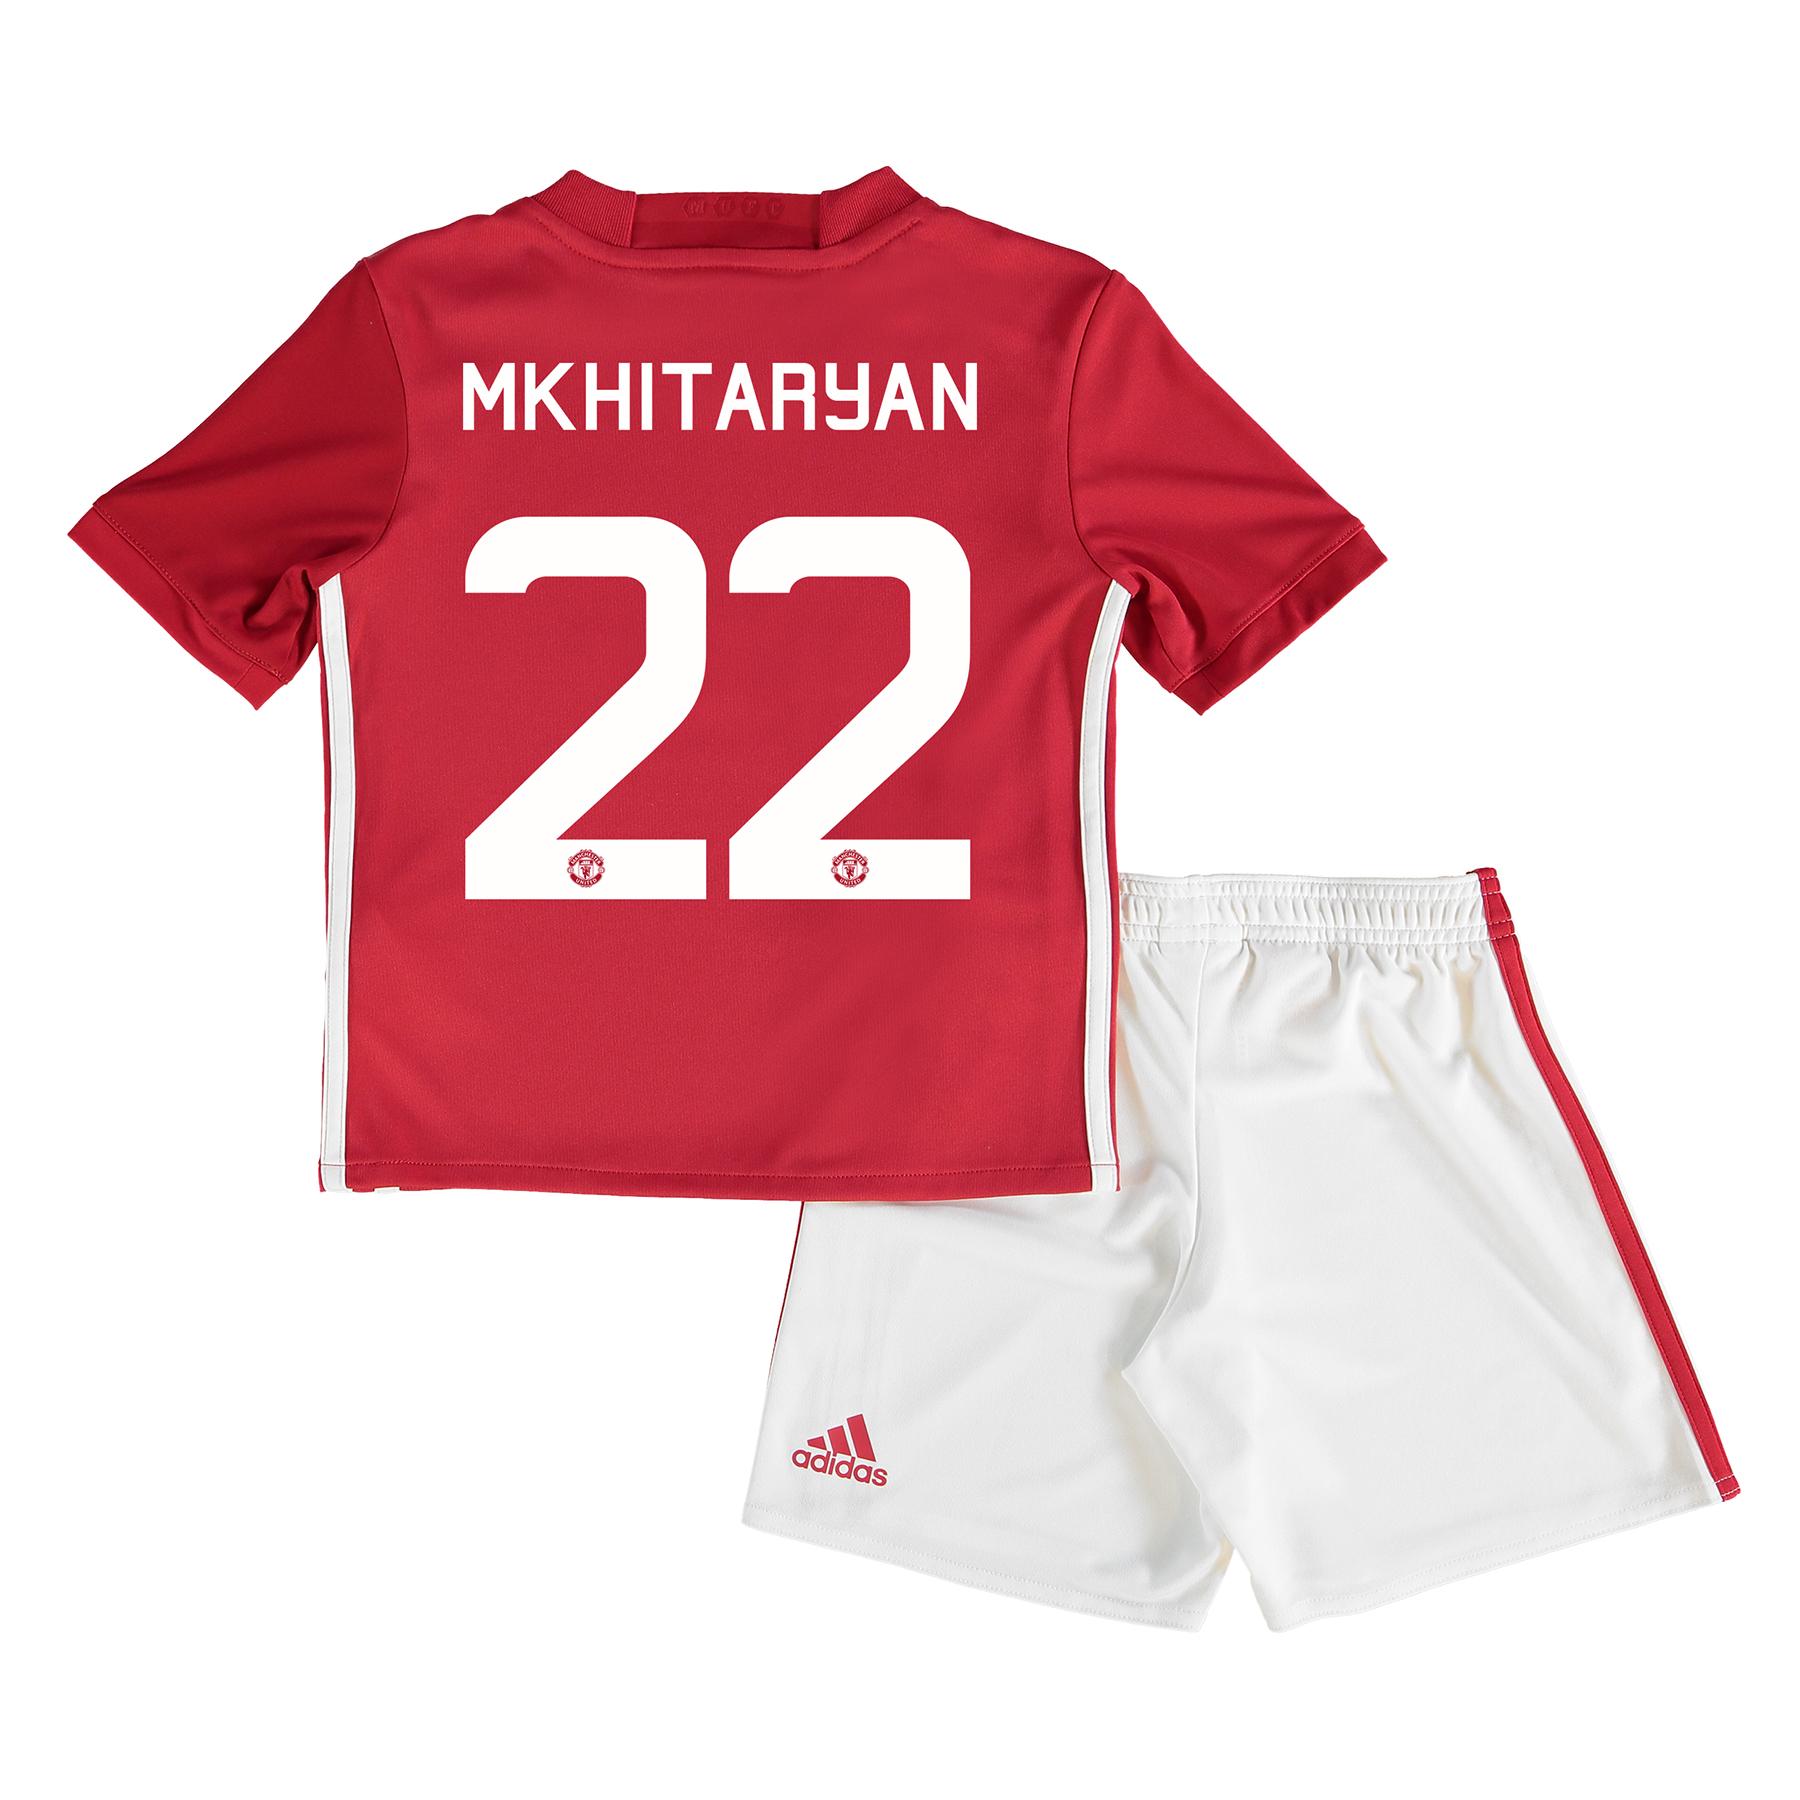 Manchester United Cup Home Mini Kit 2016-17 with Mkhitaryan 22 printin